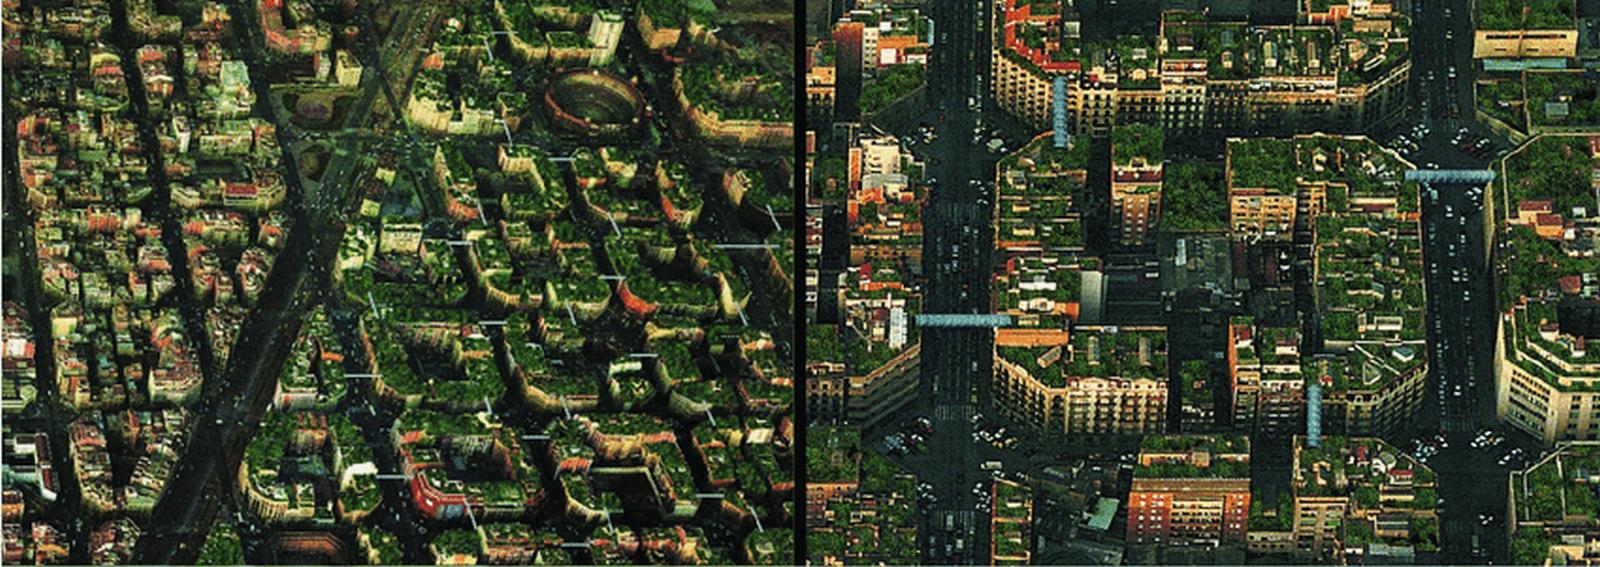 The Future of Architecture: Biodigital Architecture and Genetics - Sheet10